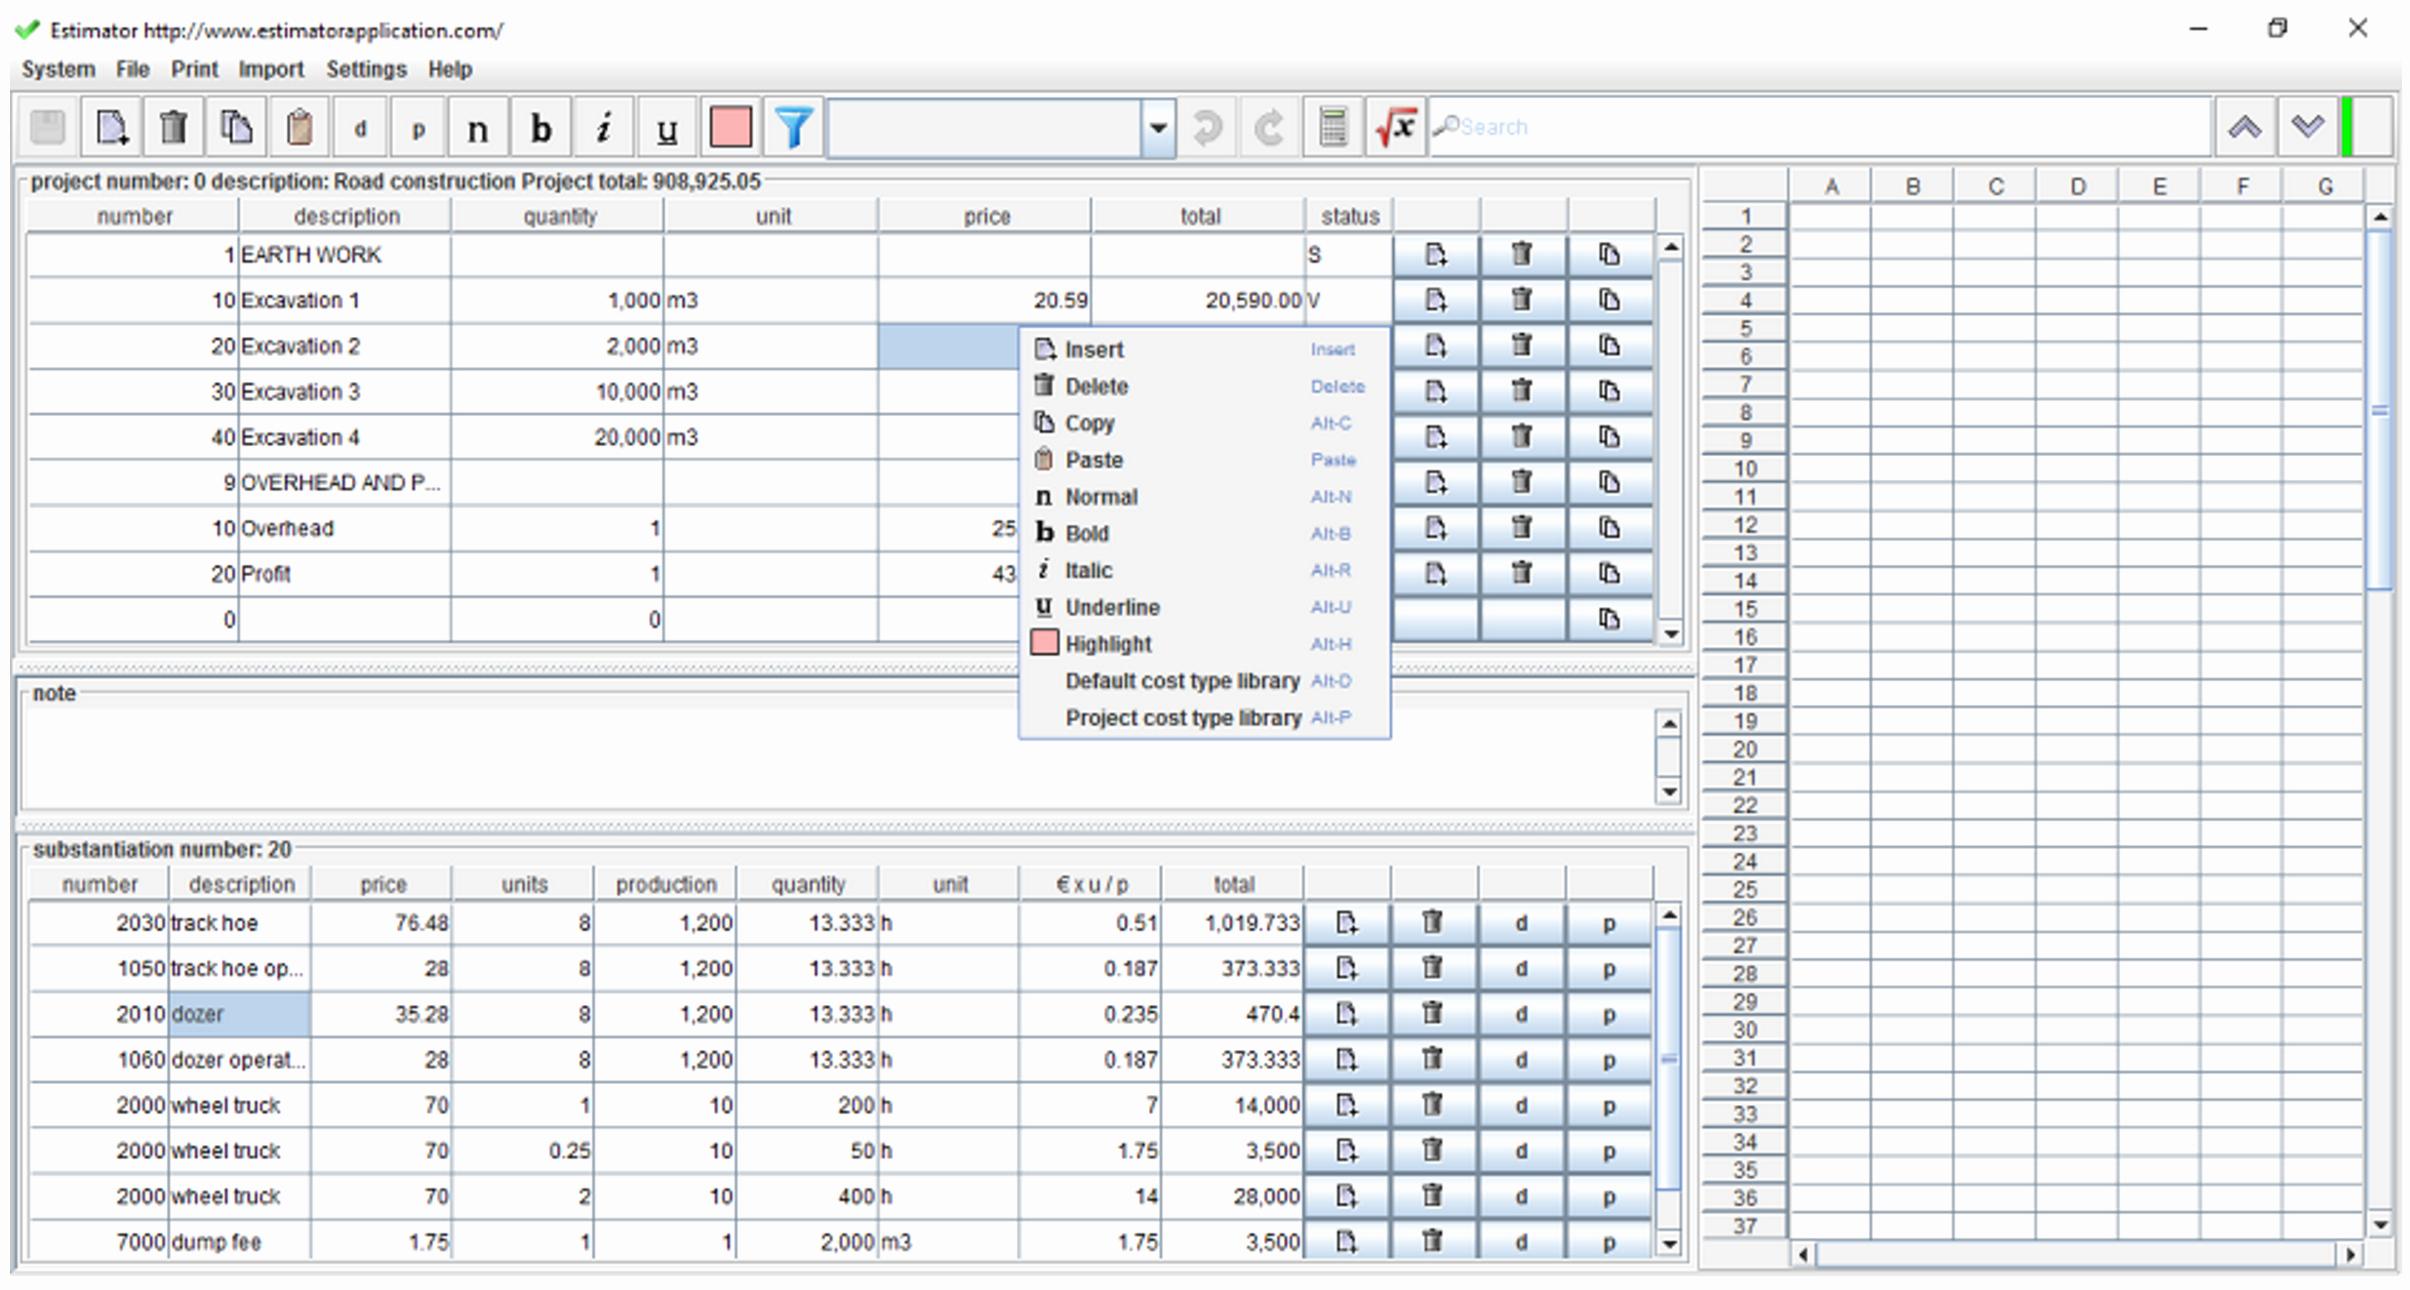 Building Construction Estimate Spreadsheet Excel Download New inside Building Construction Estimate Spreadsheet Excel Download